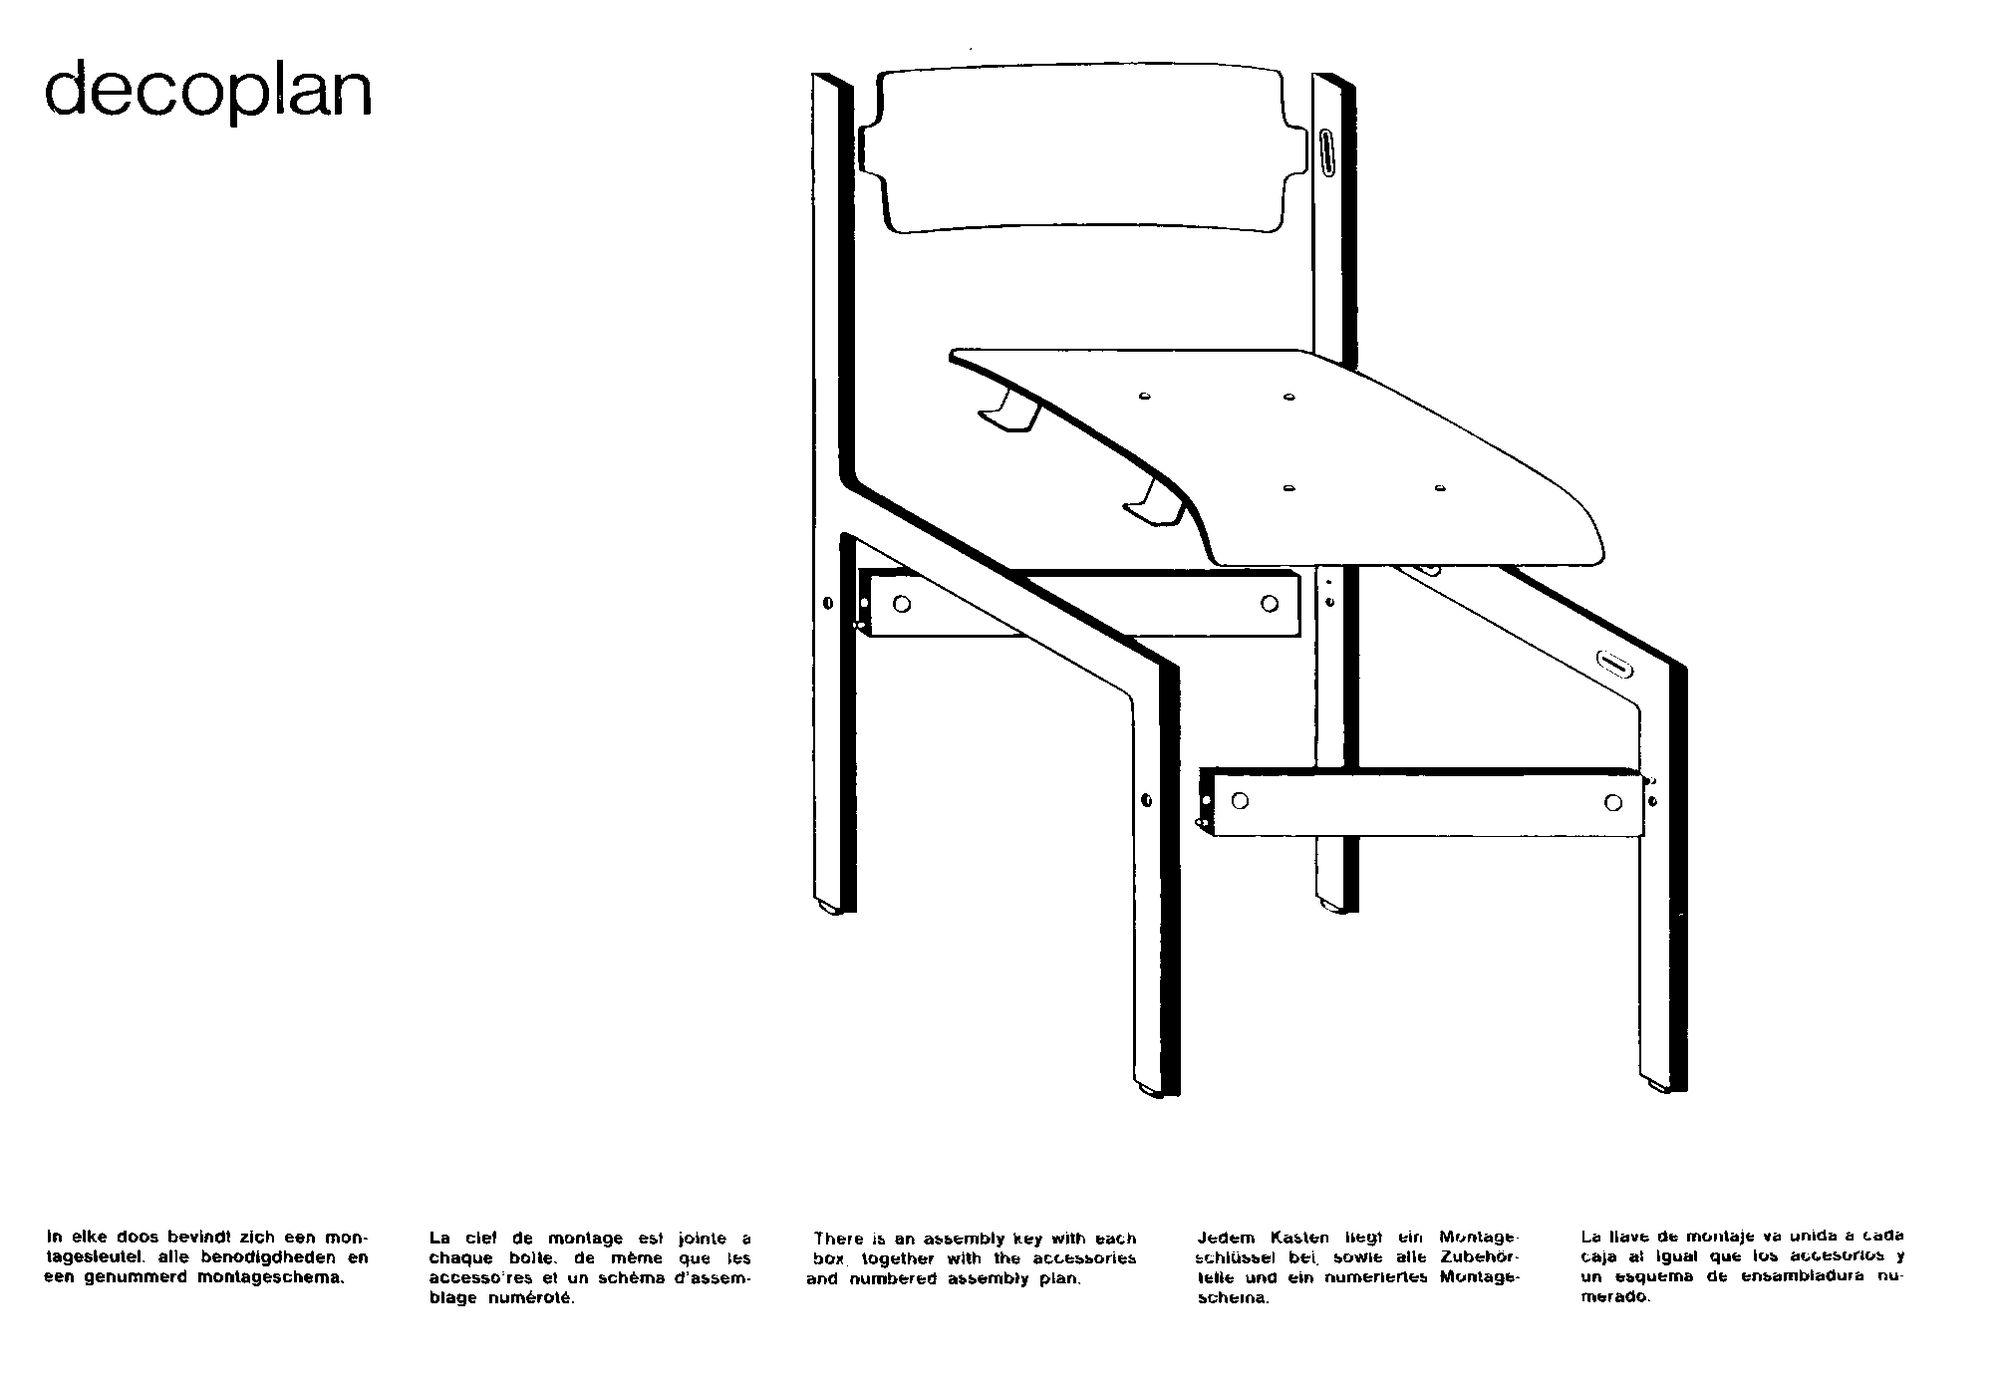 Decoplan meubelen De Coene 10